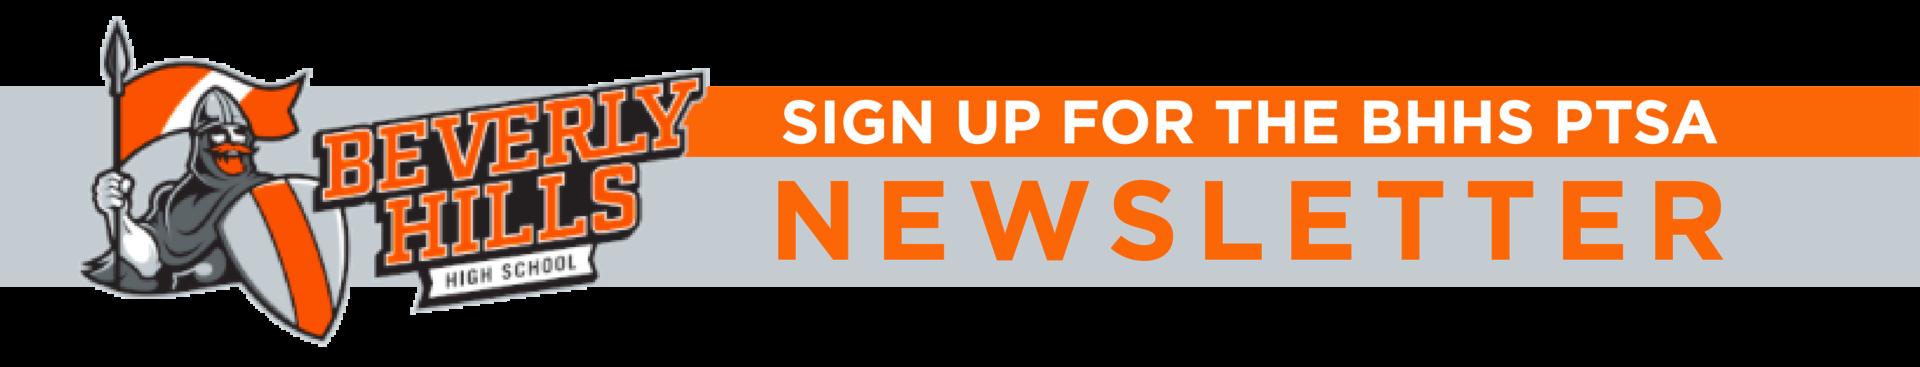 BHHS PTSA newsletter sign up